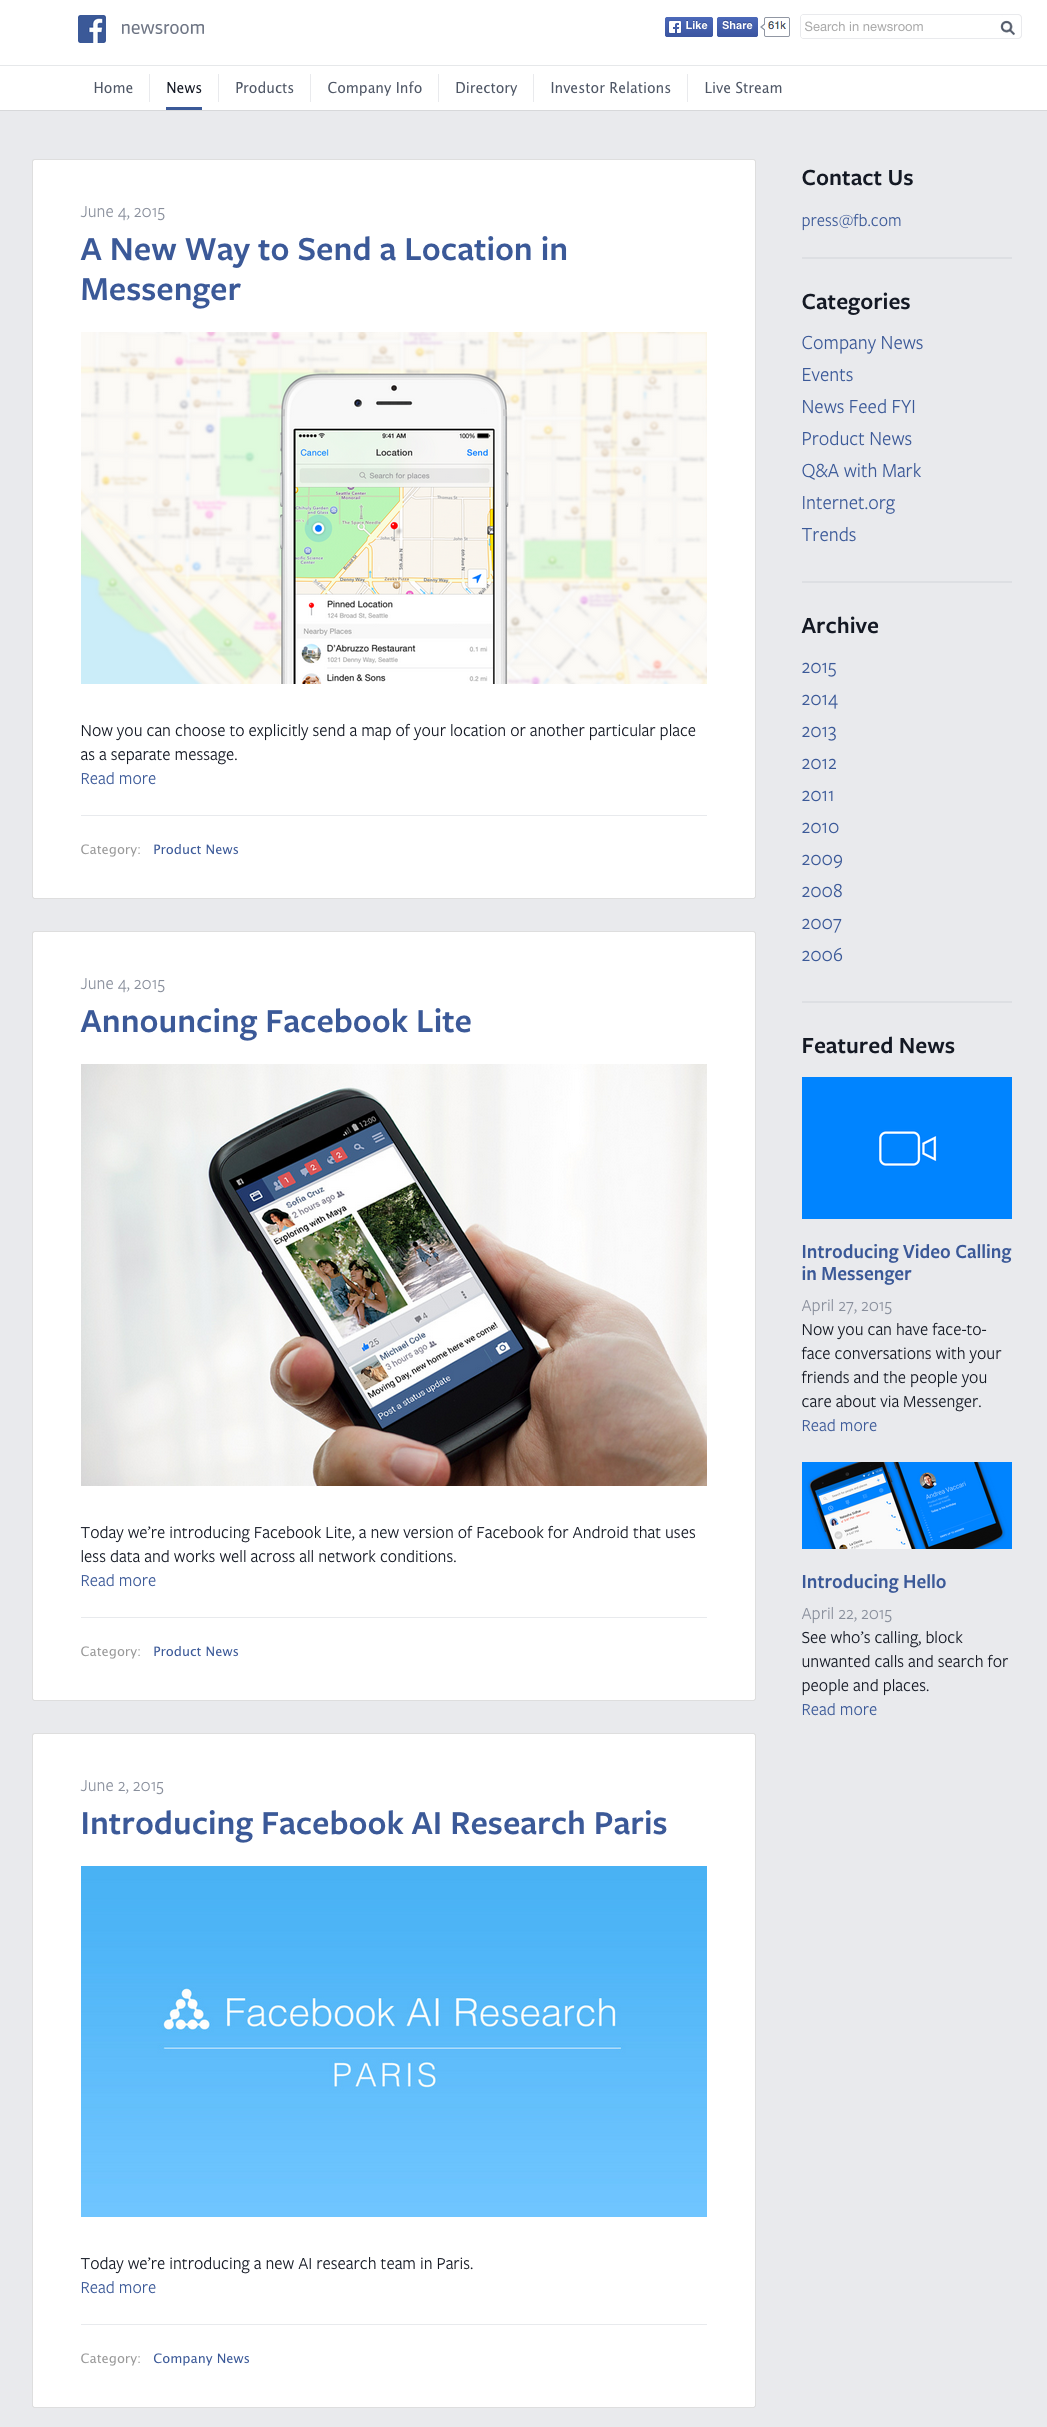 Facebook_Newsroom.png